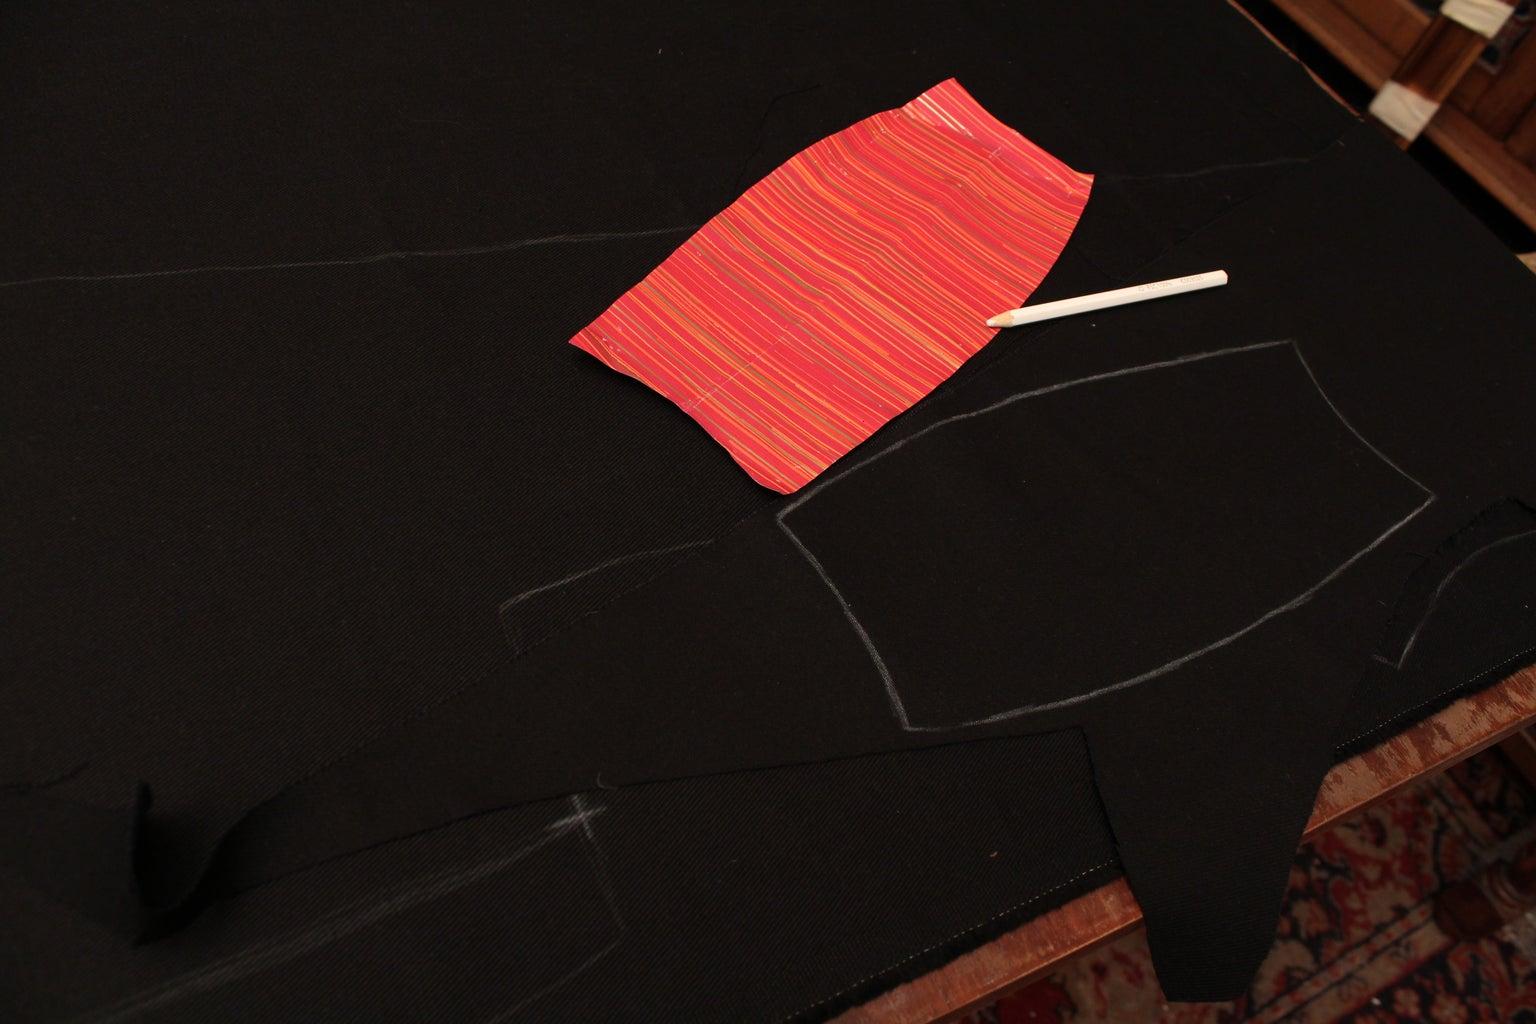 Planning & Patterning